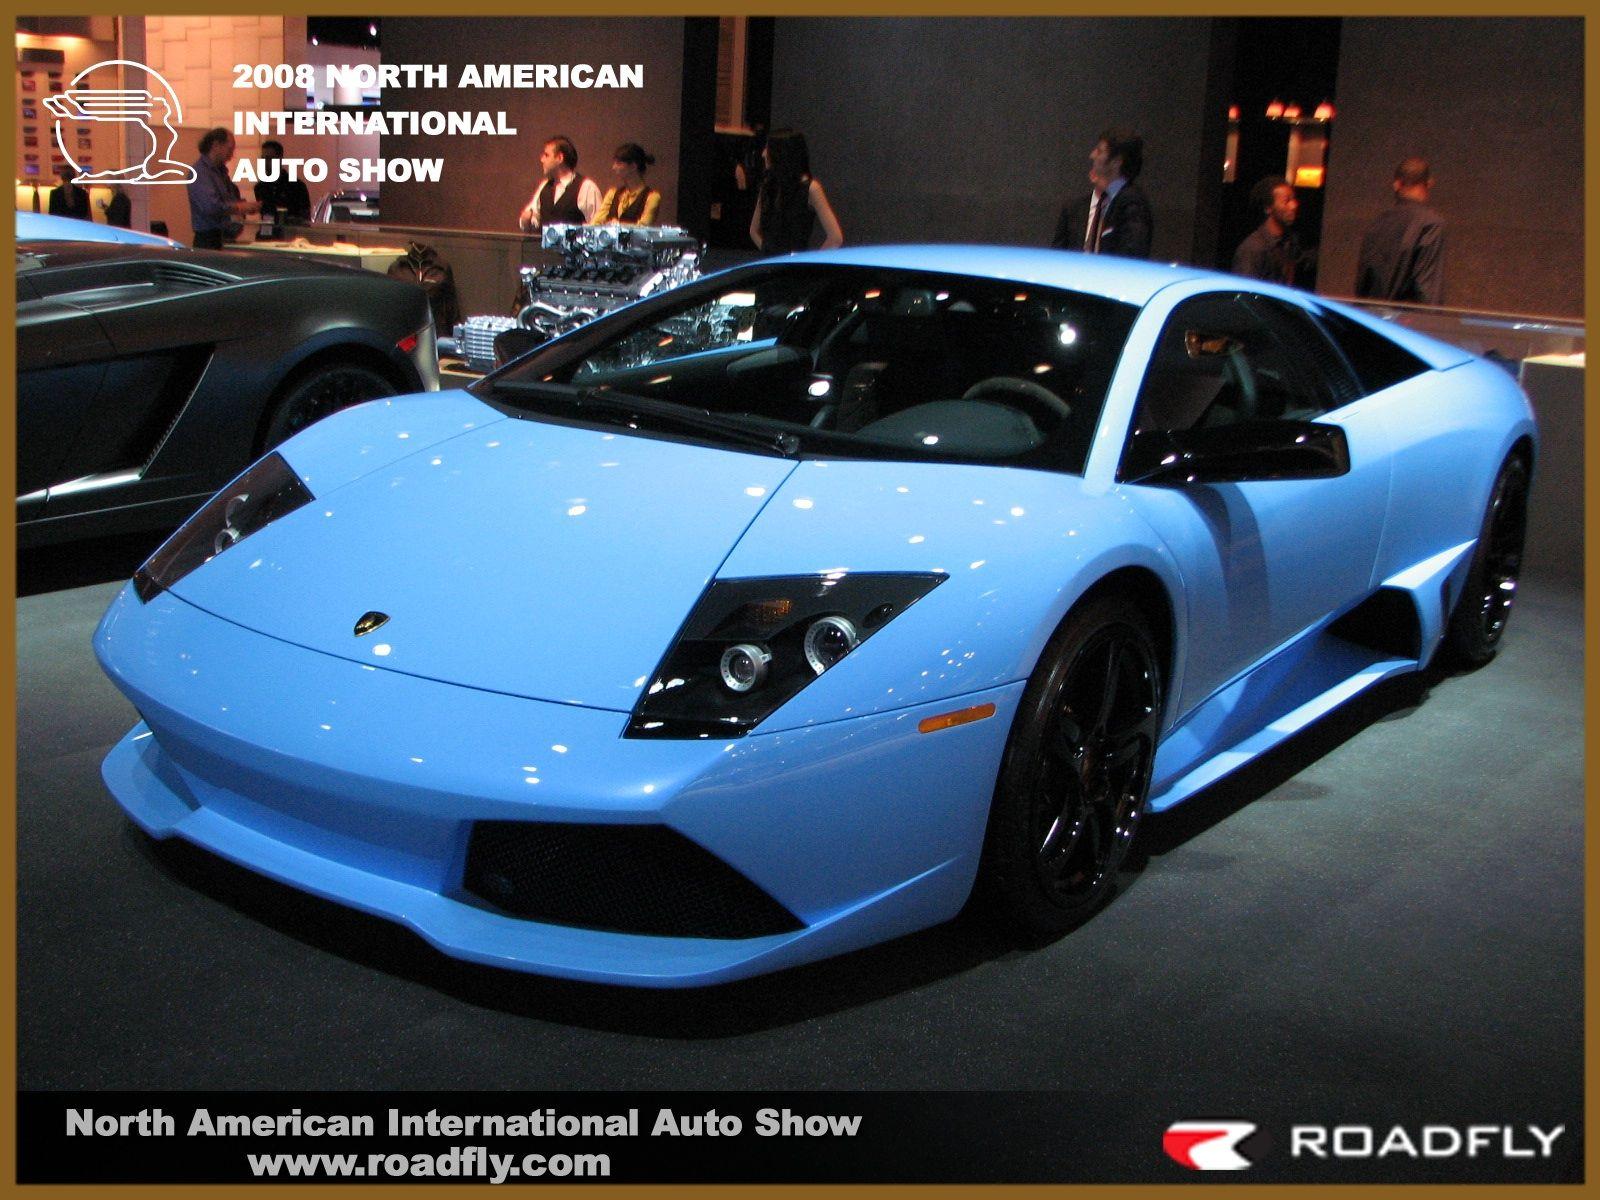 Lamborghini Murcielago Lp640 Lordhavemercy Dream Cars